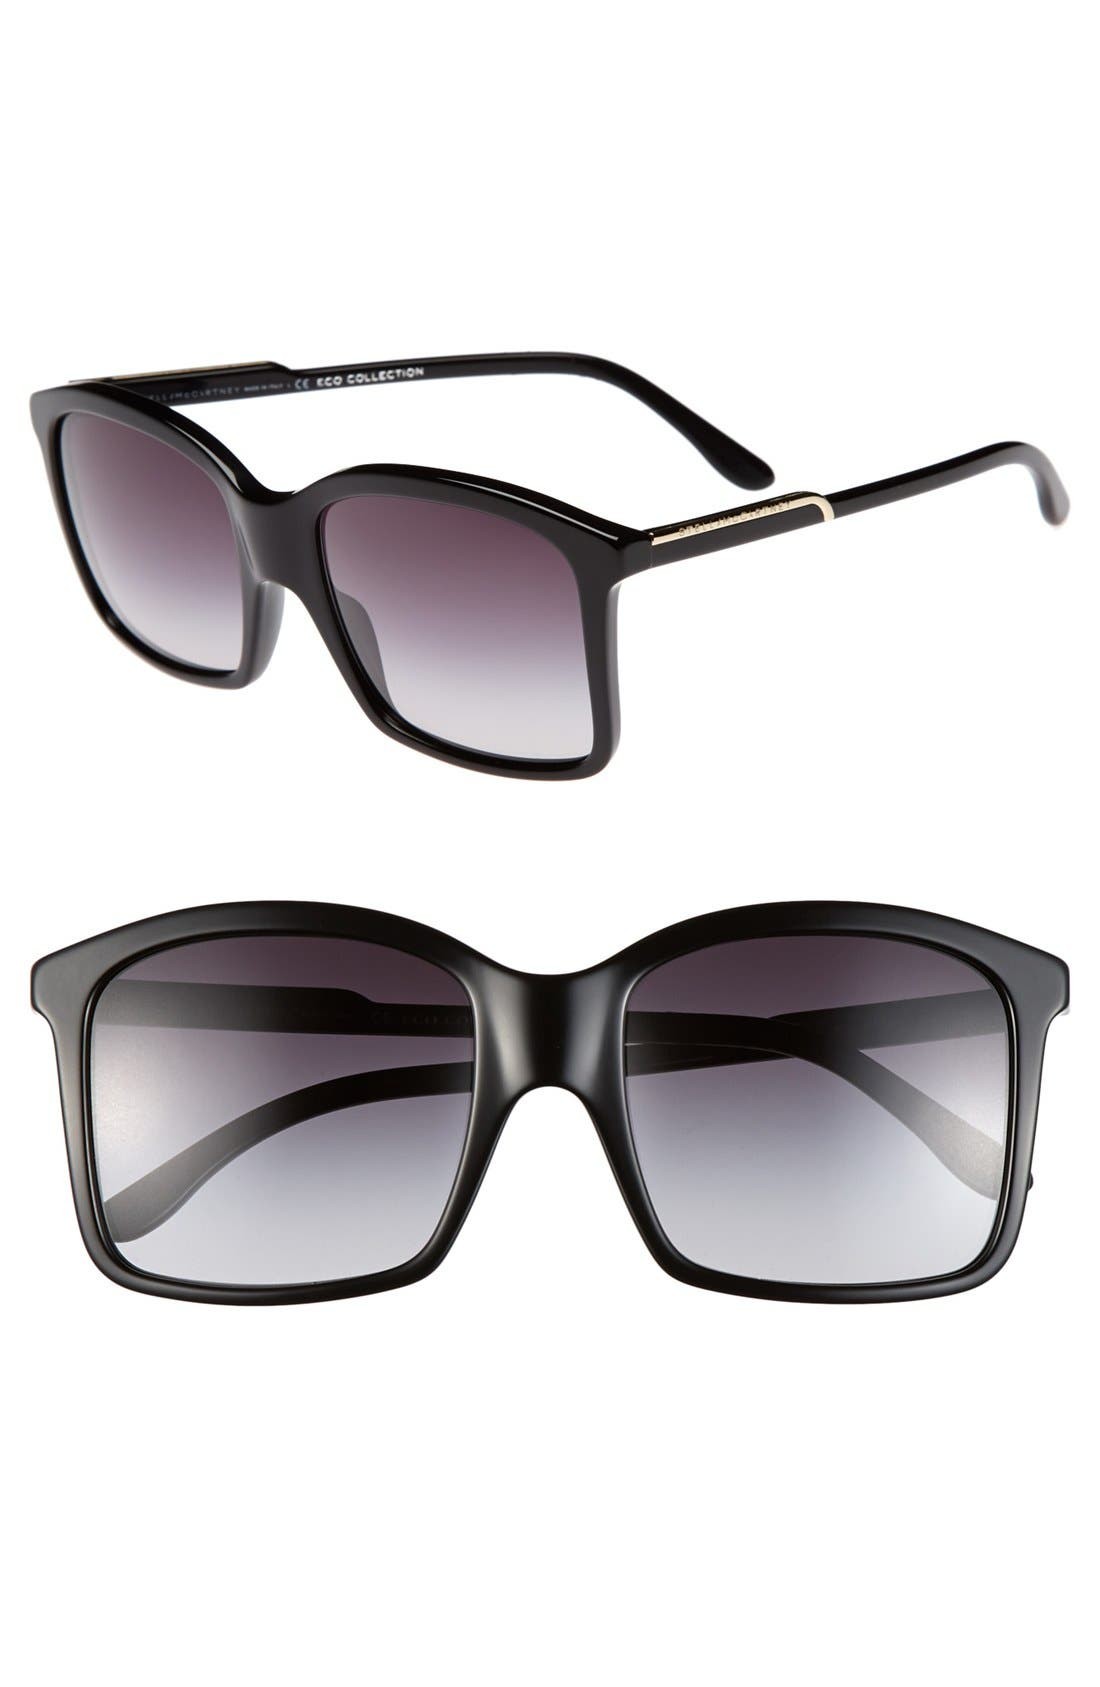 Main Image - Stella McCartney 54mm Oversized Sunglasses